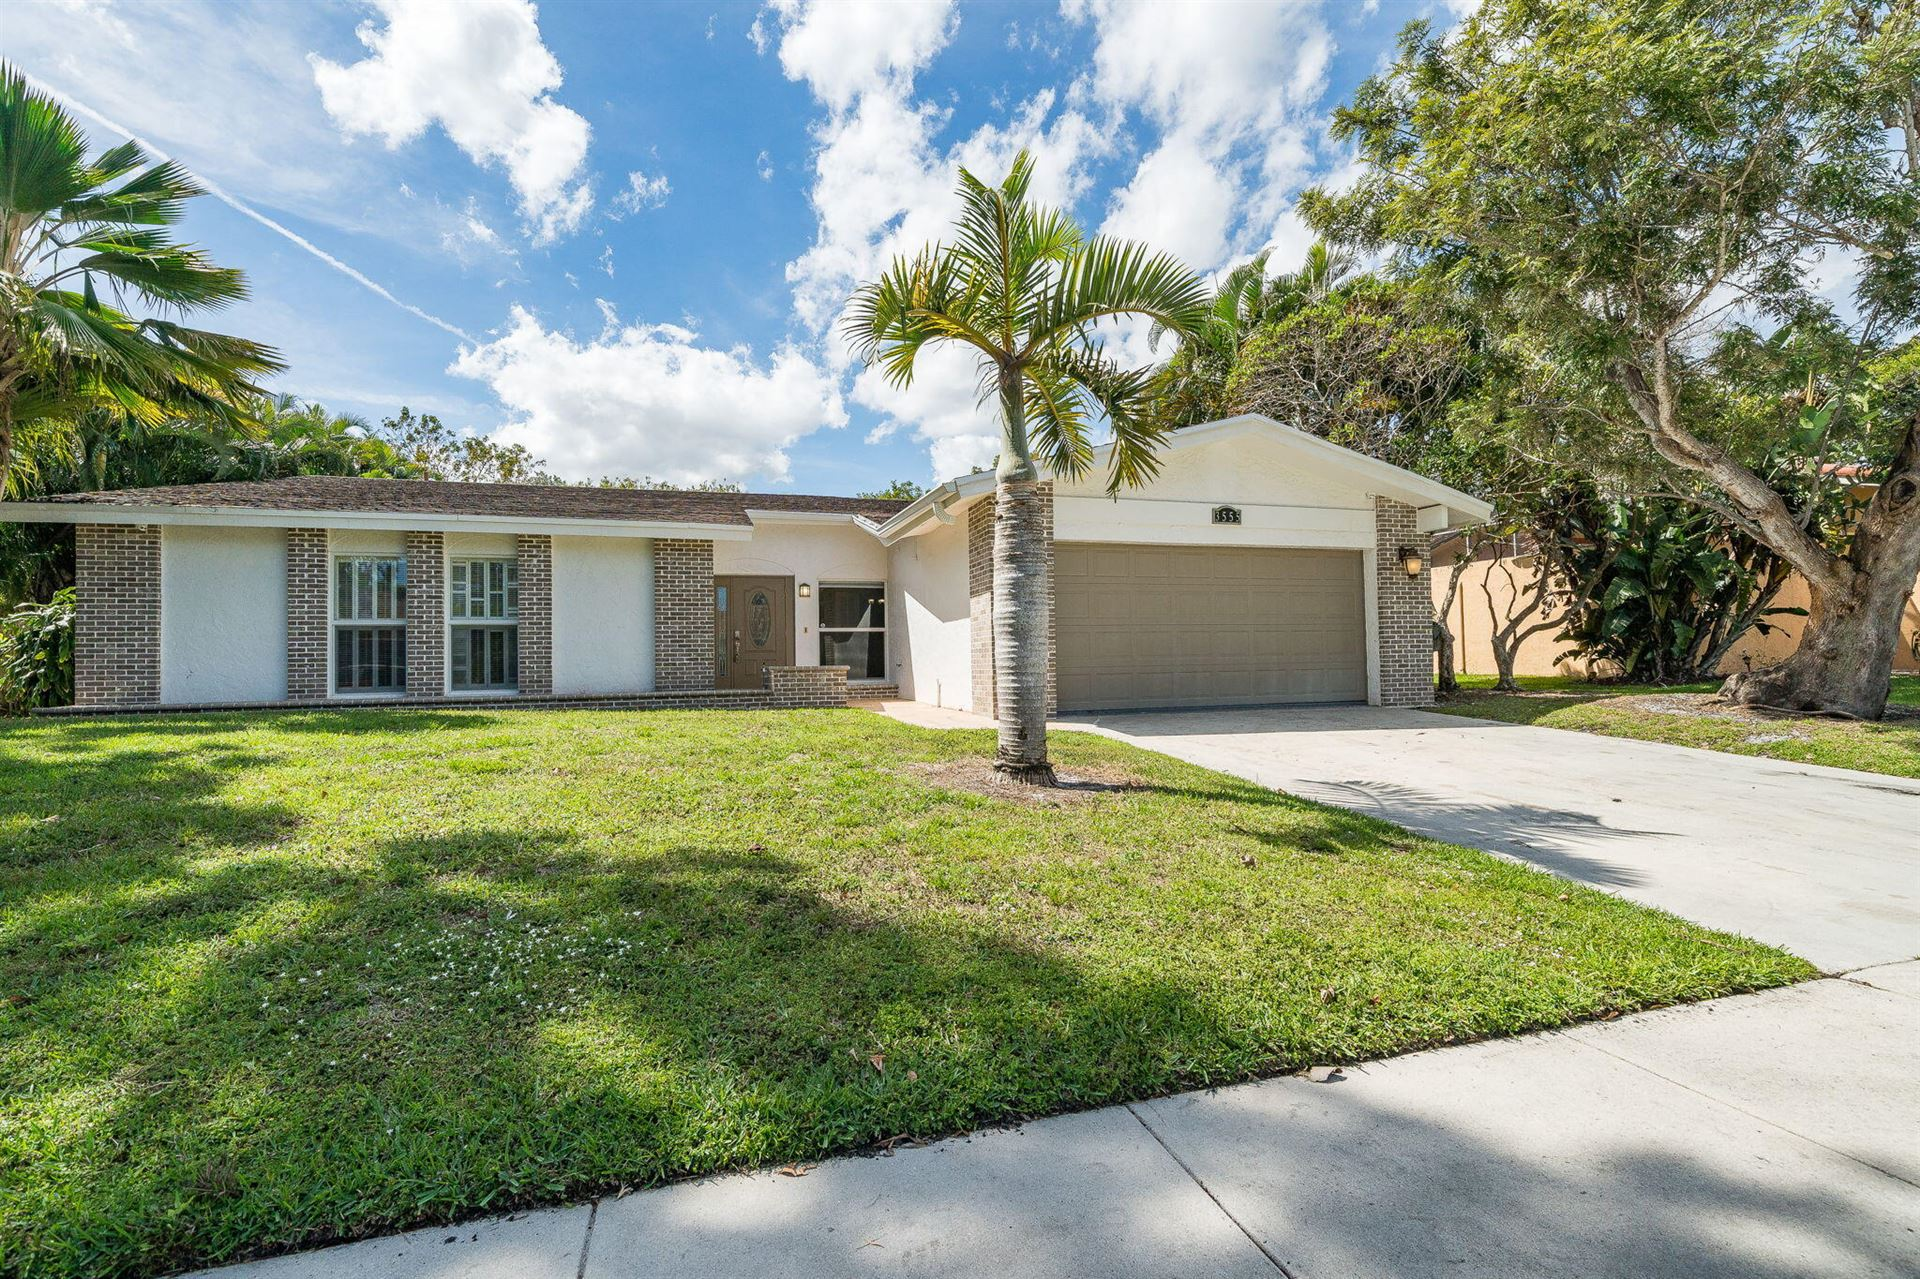 Photo of 3555 NW 27th Avenue, Boca Raton, FL 33434 (MLS # RX-10697072)